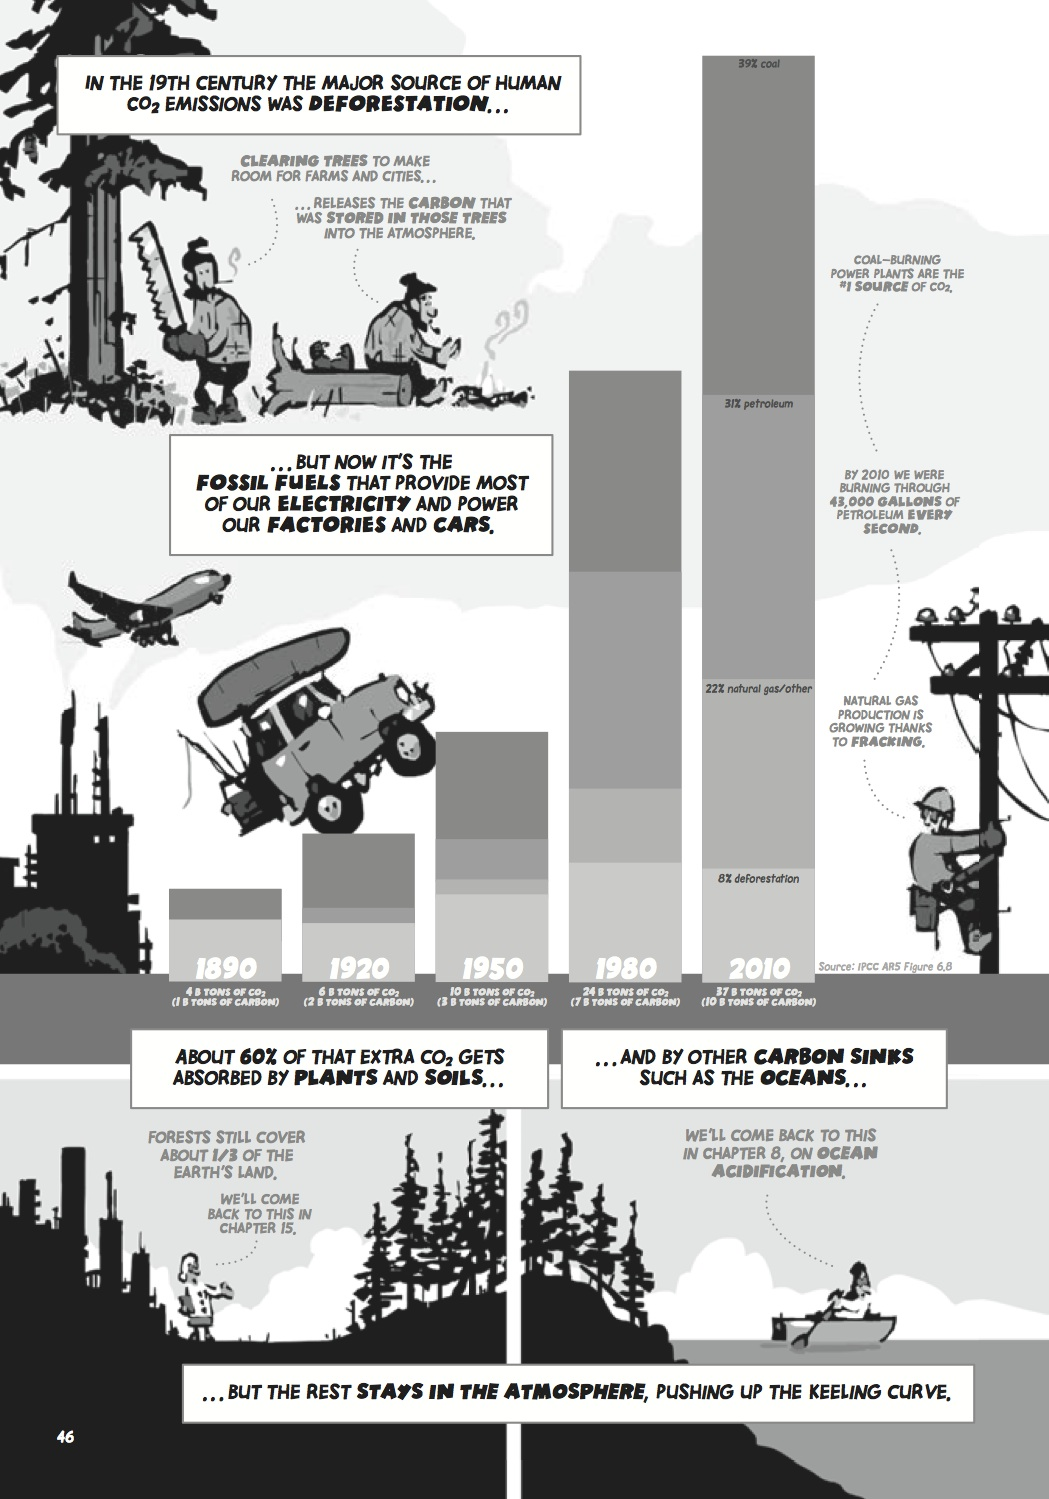 CICC p46 CO2 sources & sinks